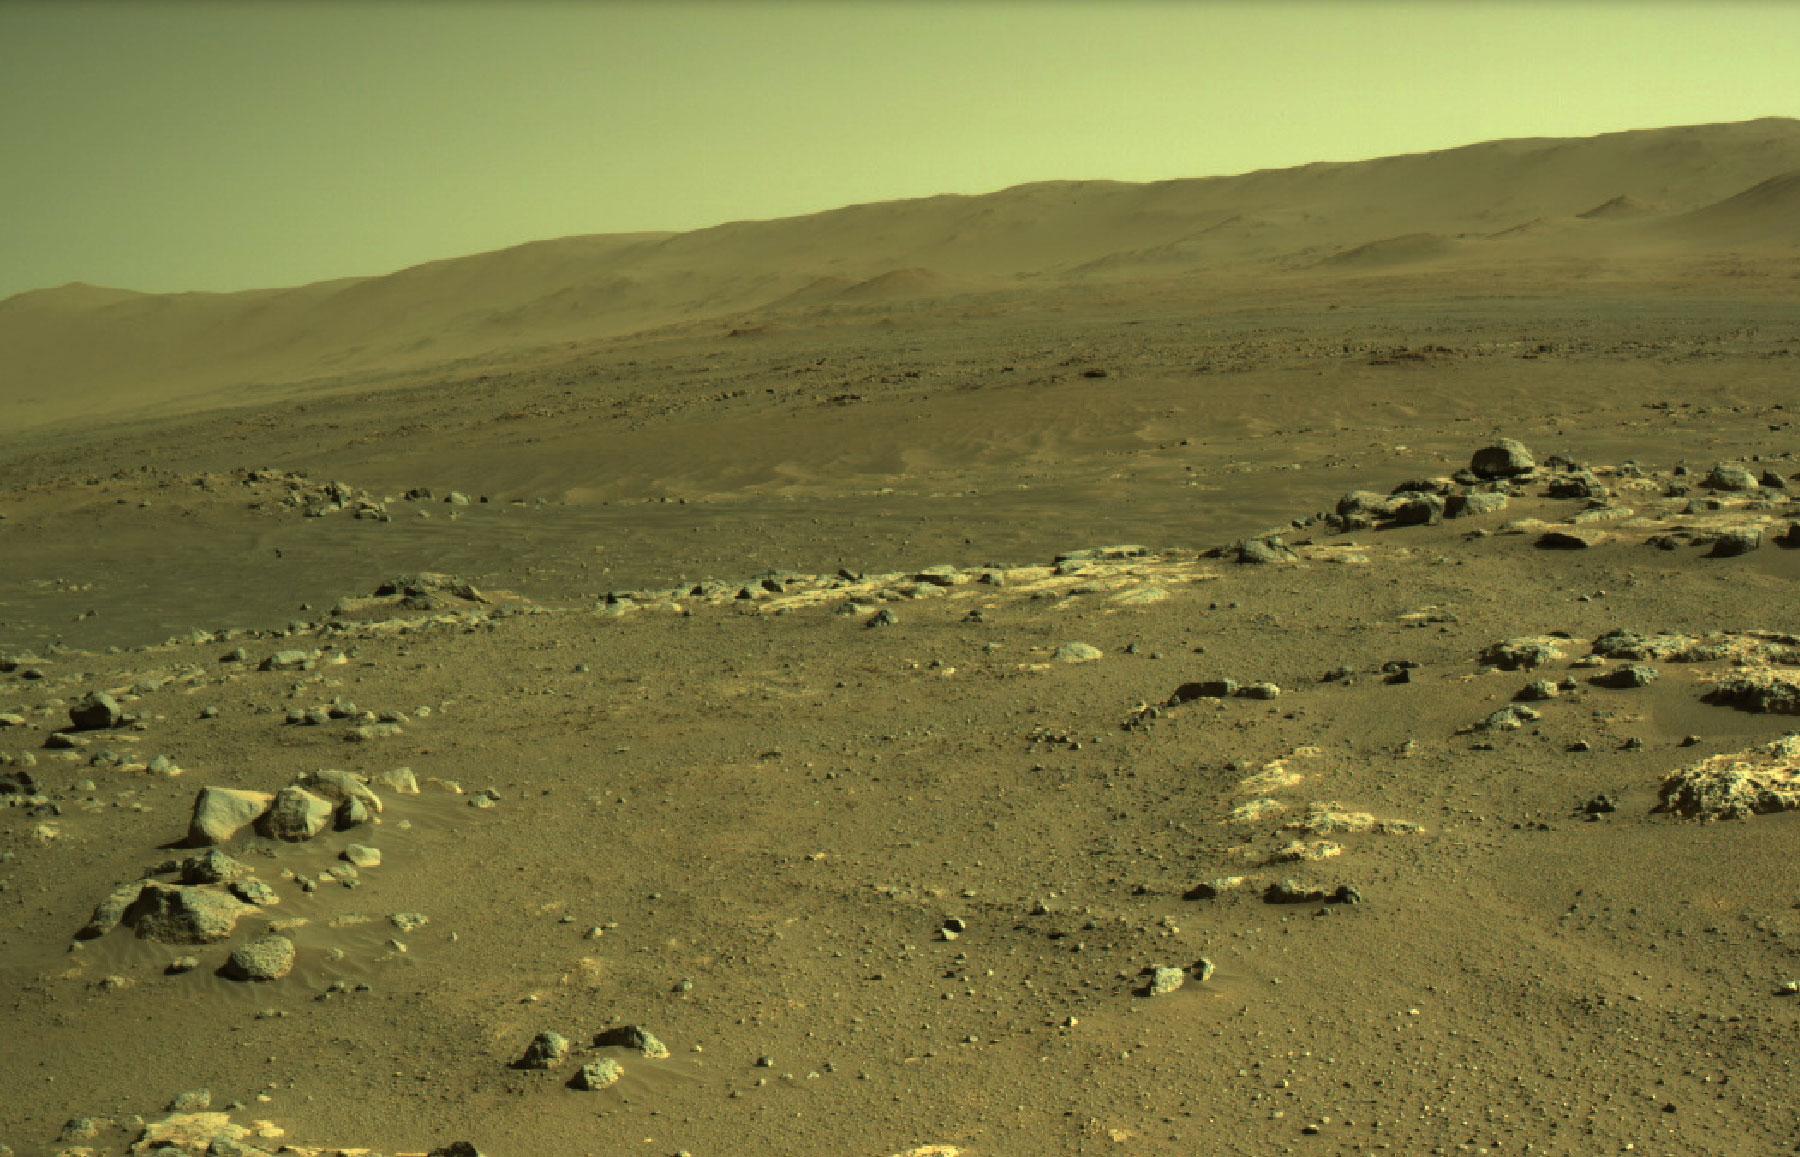 Mars 2020 (Perseverance - Ingenuity) : exploration du cratère Jezero - Page 18 26034_Perseverance-Looks-Out-Over-Seitah